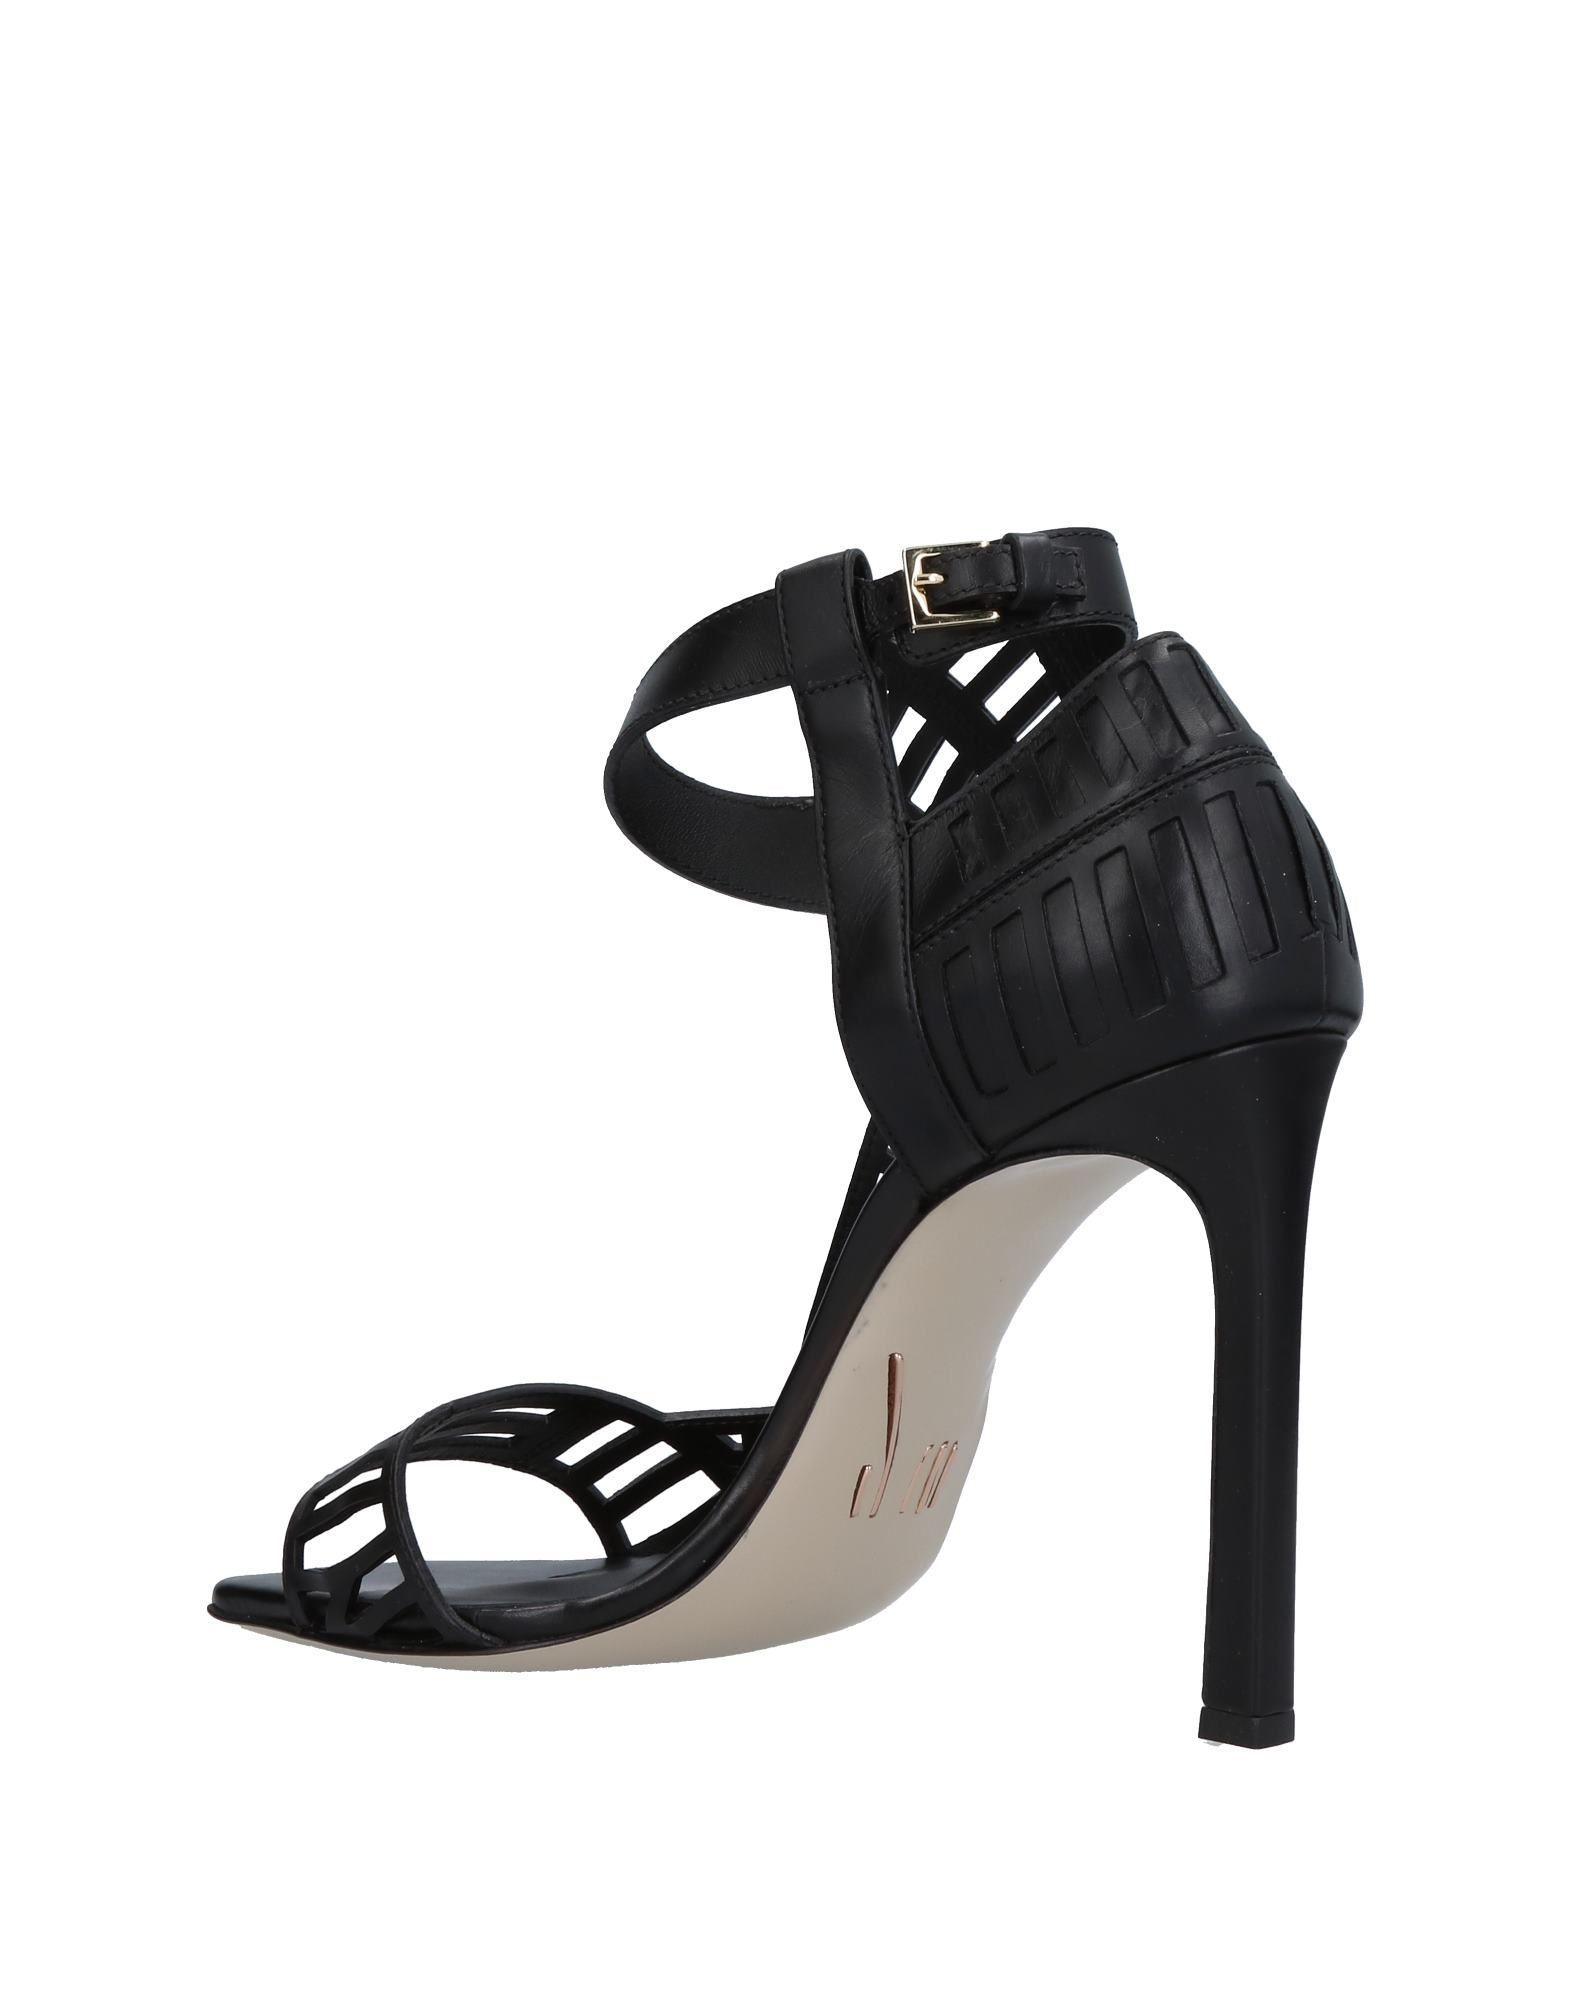 Chaussures - Sandales Daniele Michetti PgBzqc6